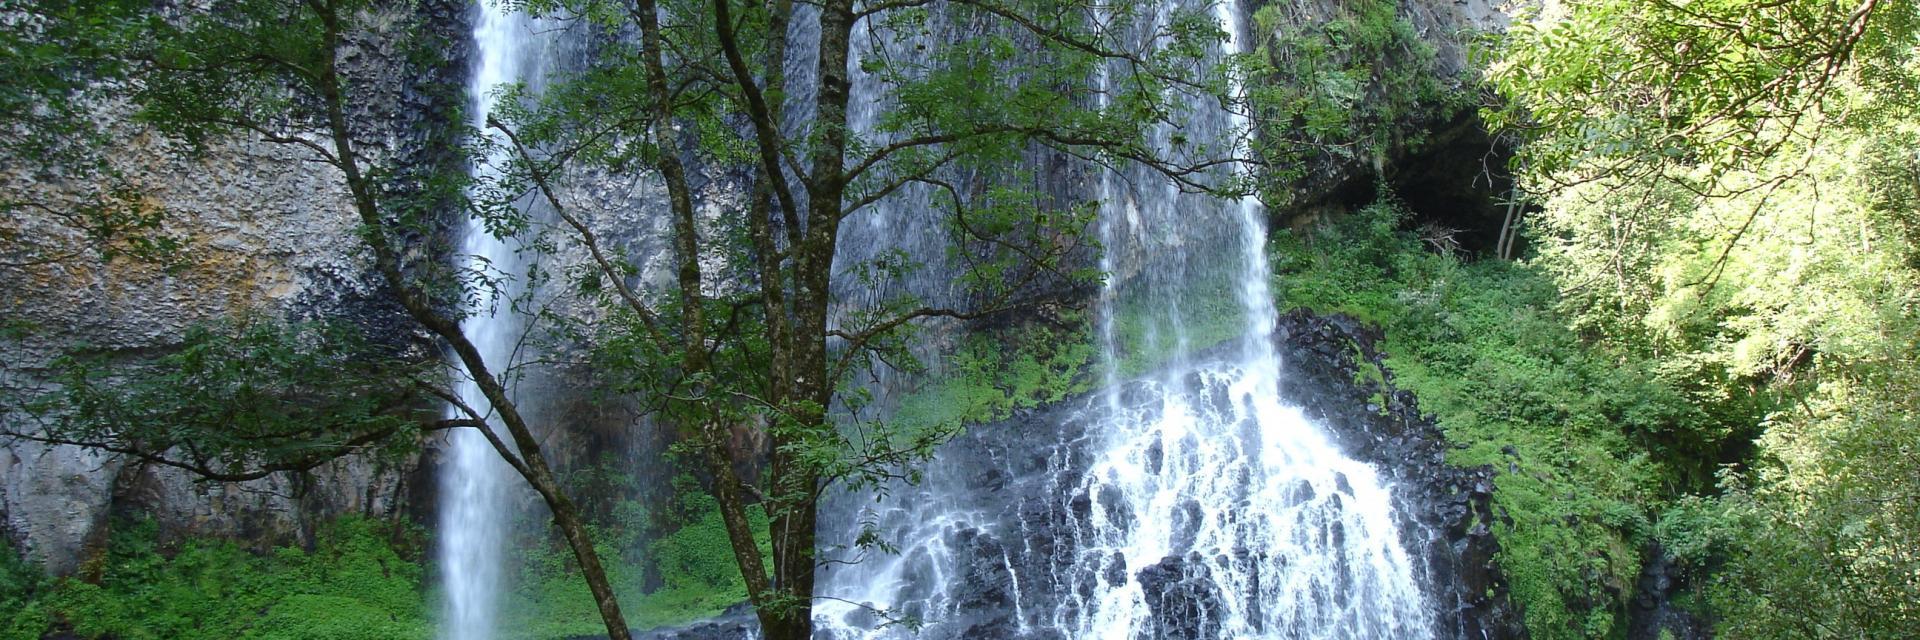 La Cascade de la Beaume